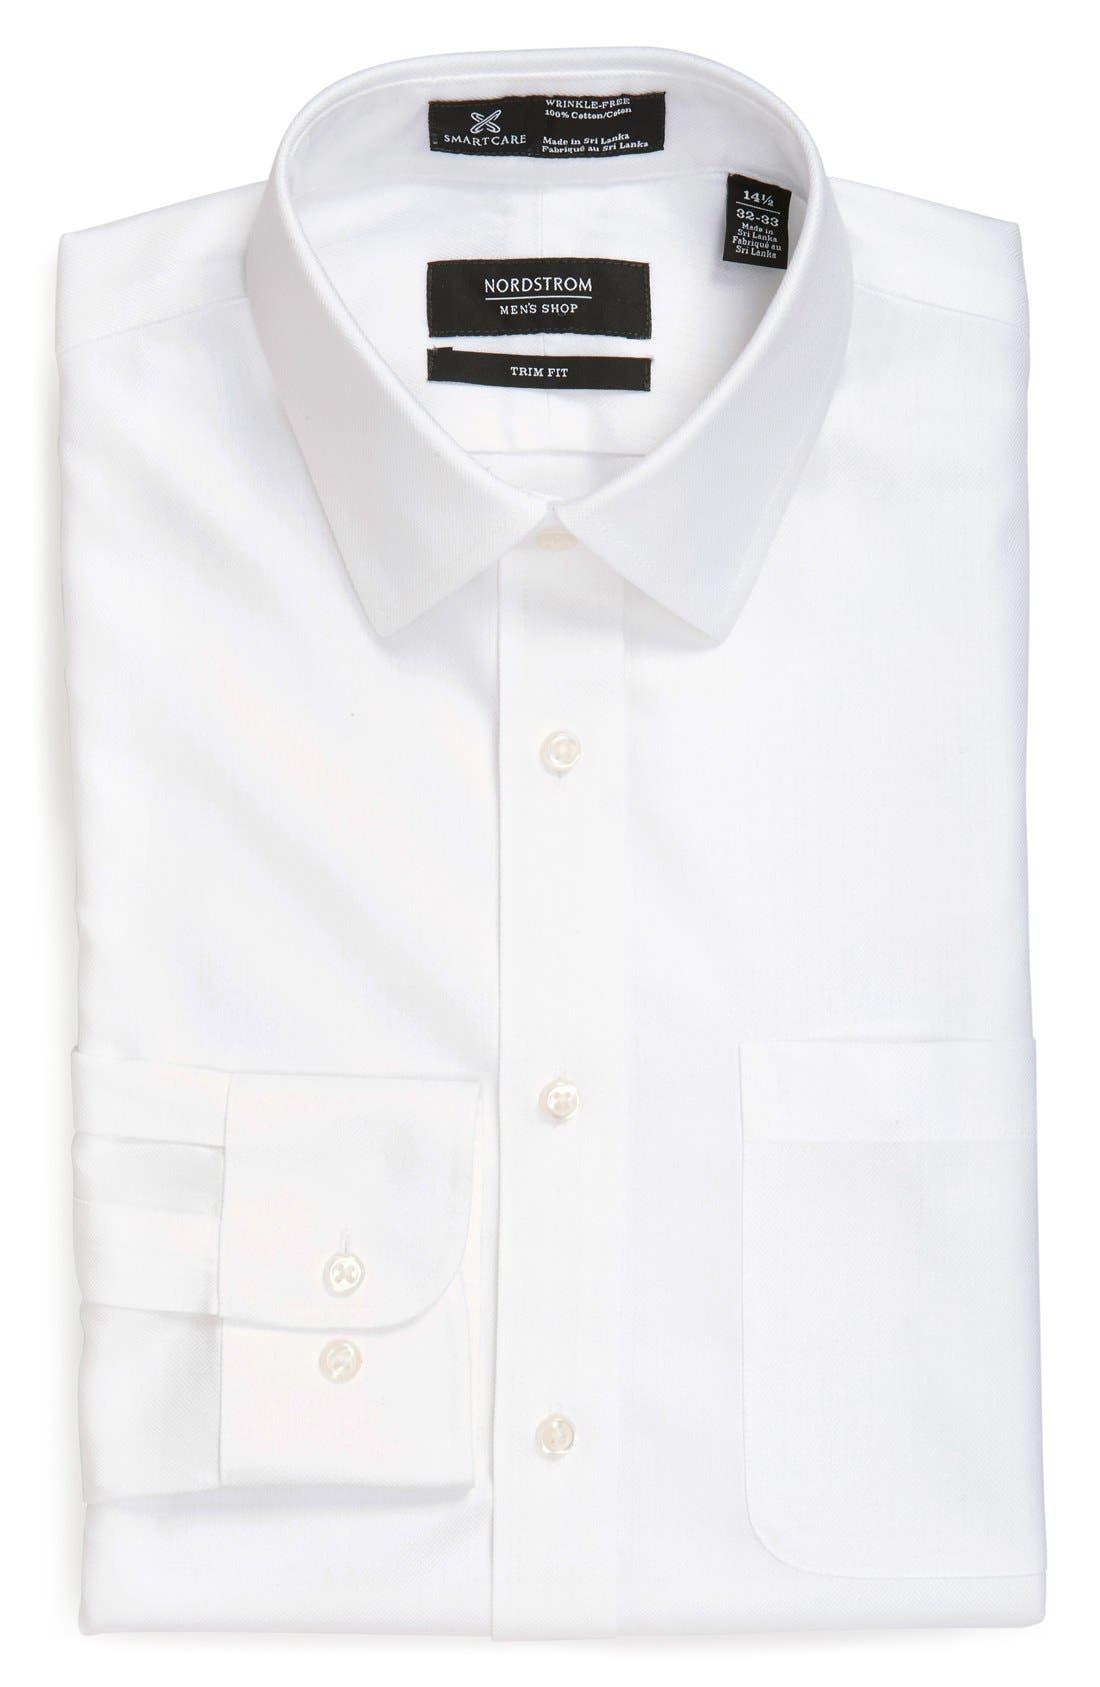 Nordstrom Men's Shop Smartcare™ Trim Fit Herringbone Dress Shirt